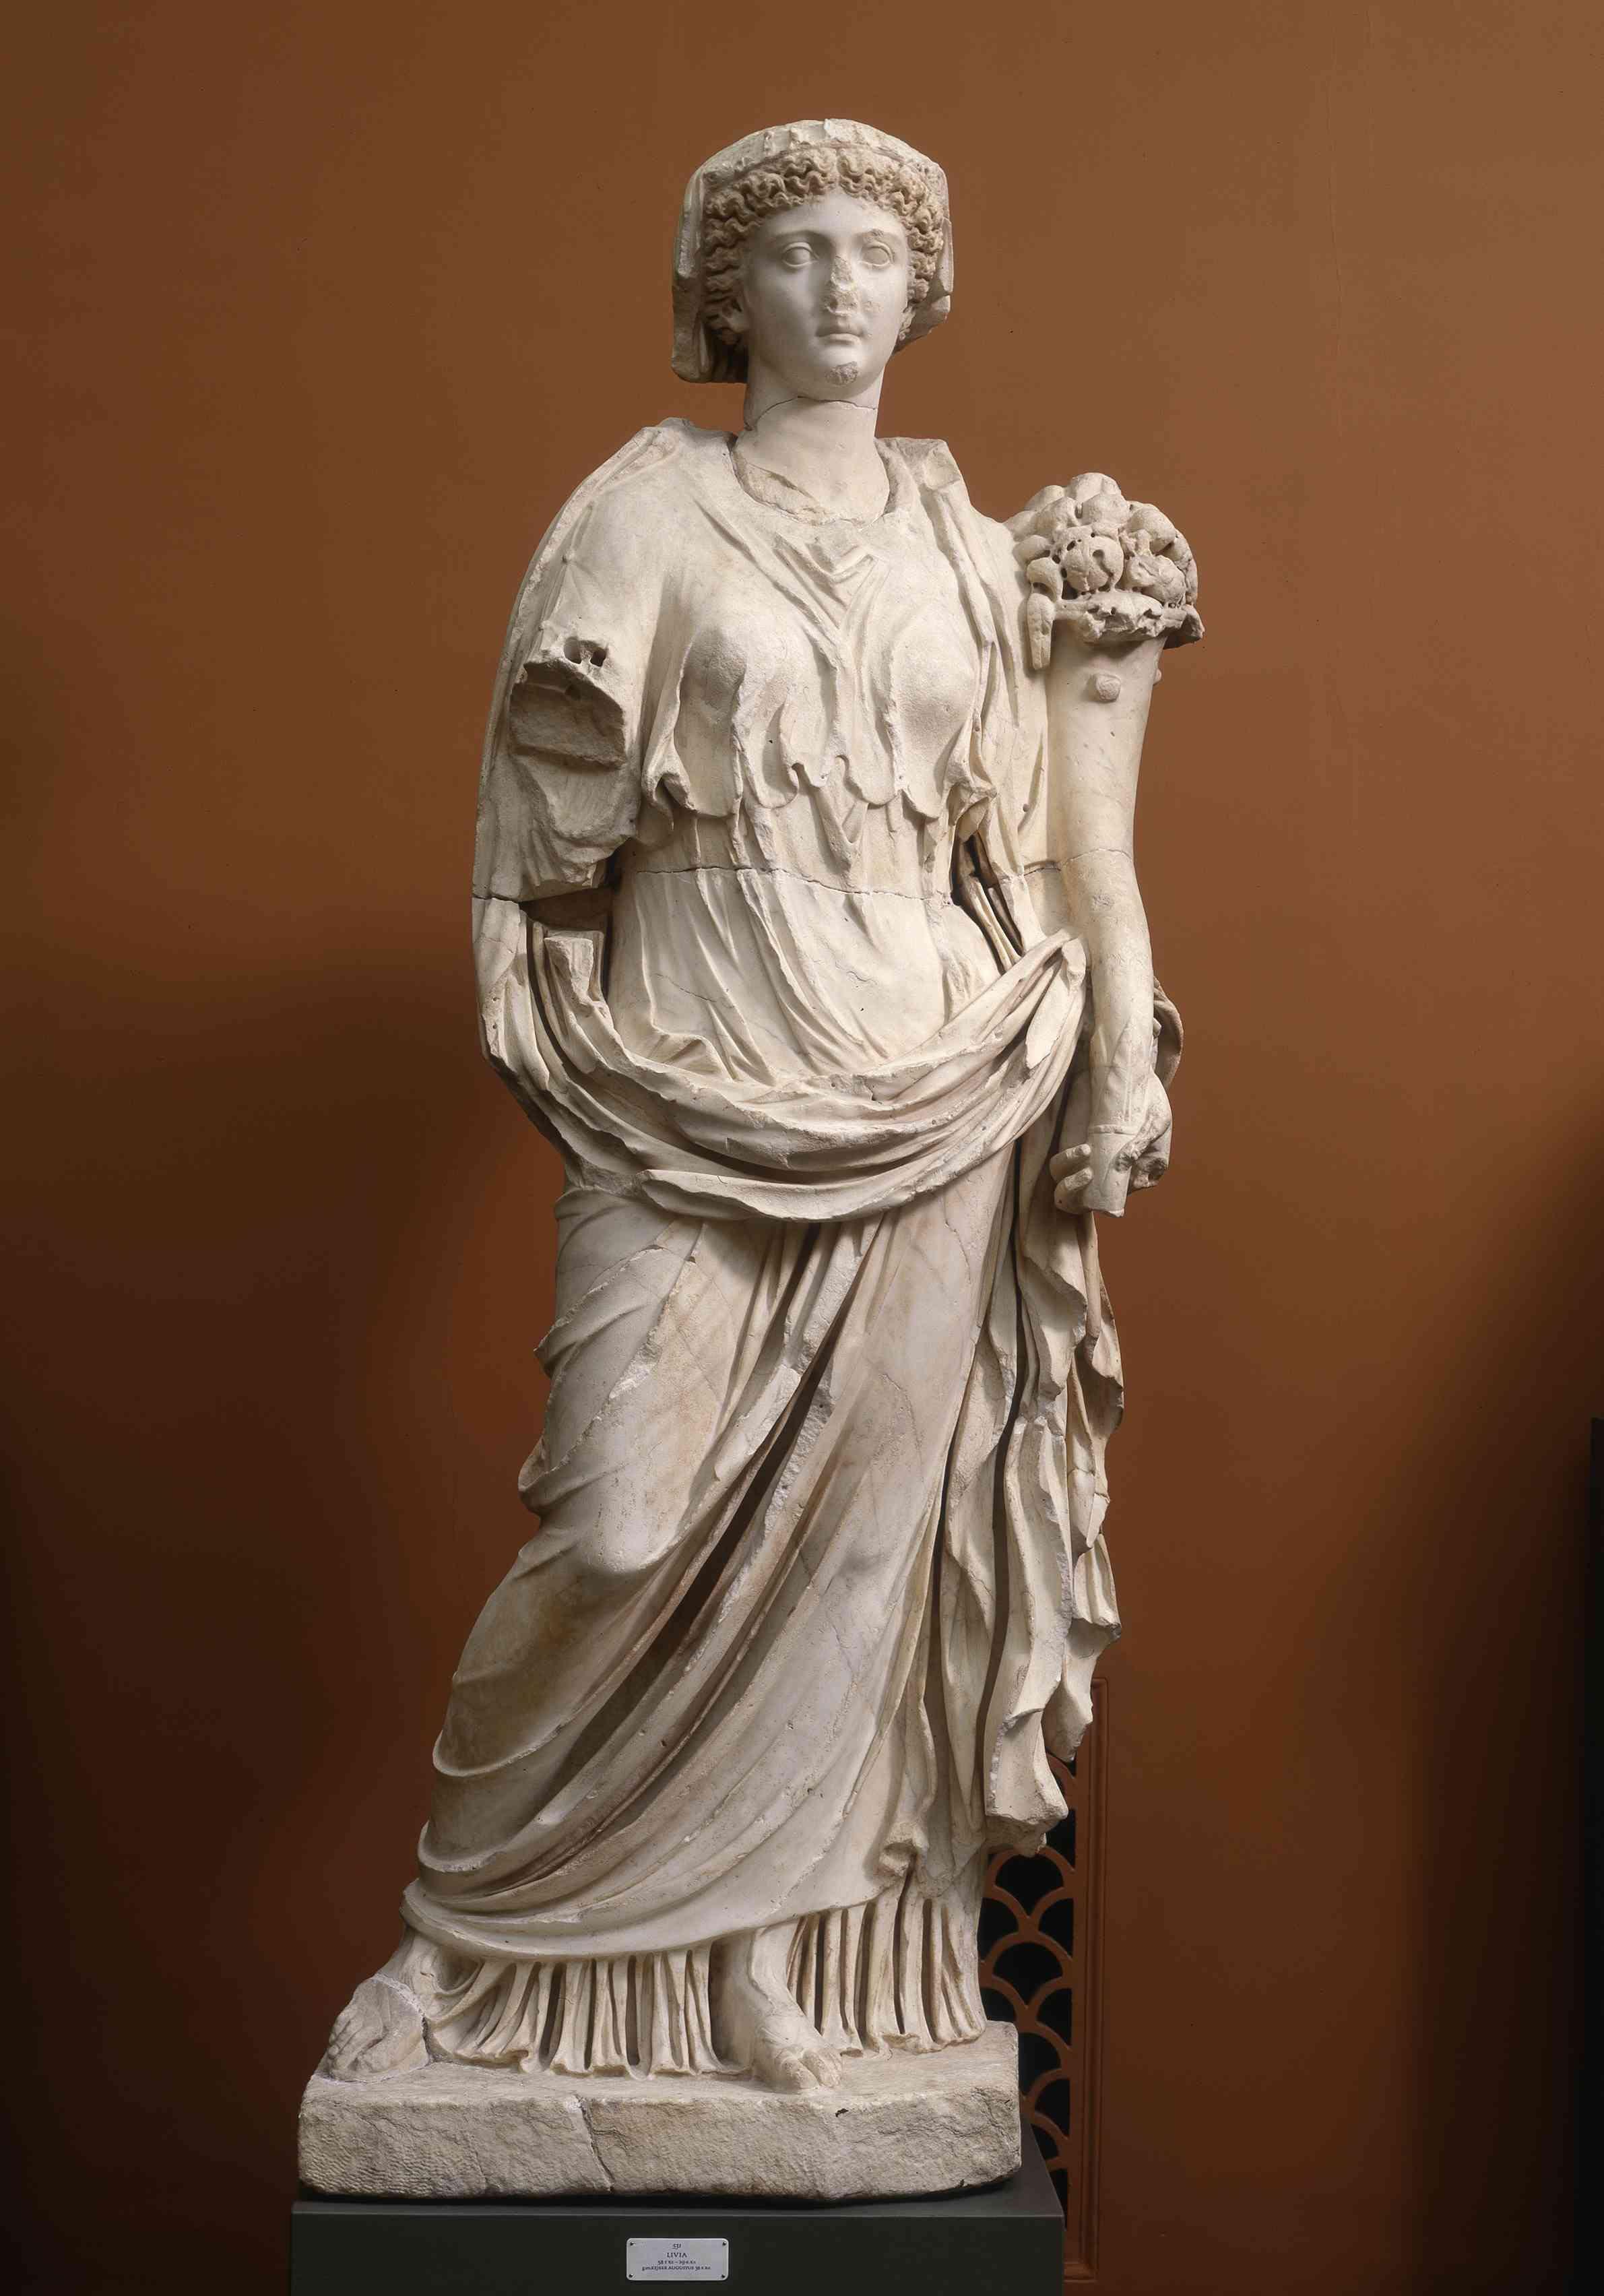 Livia, wife of Augustus, mother of Emperor Tiberius, Roman statue (marble), 1st century BC - 1st century AD, (Ny Carlsberg Glyptotek, Copenhagen).